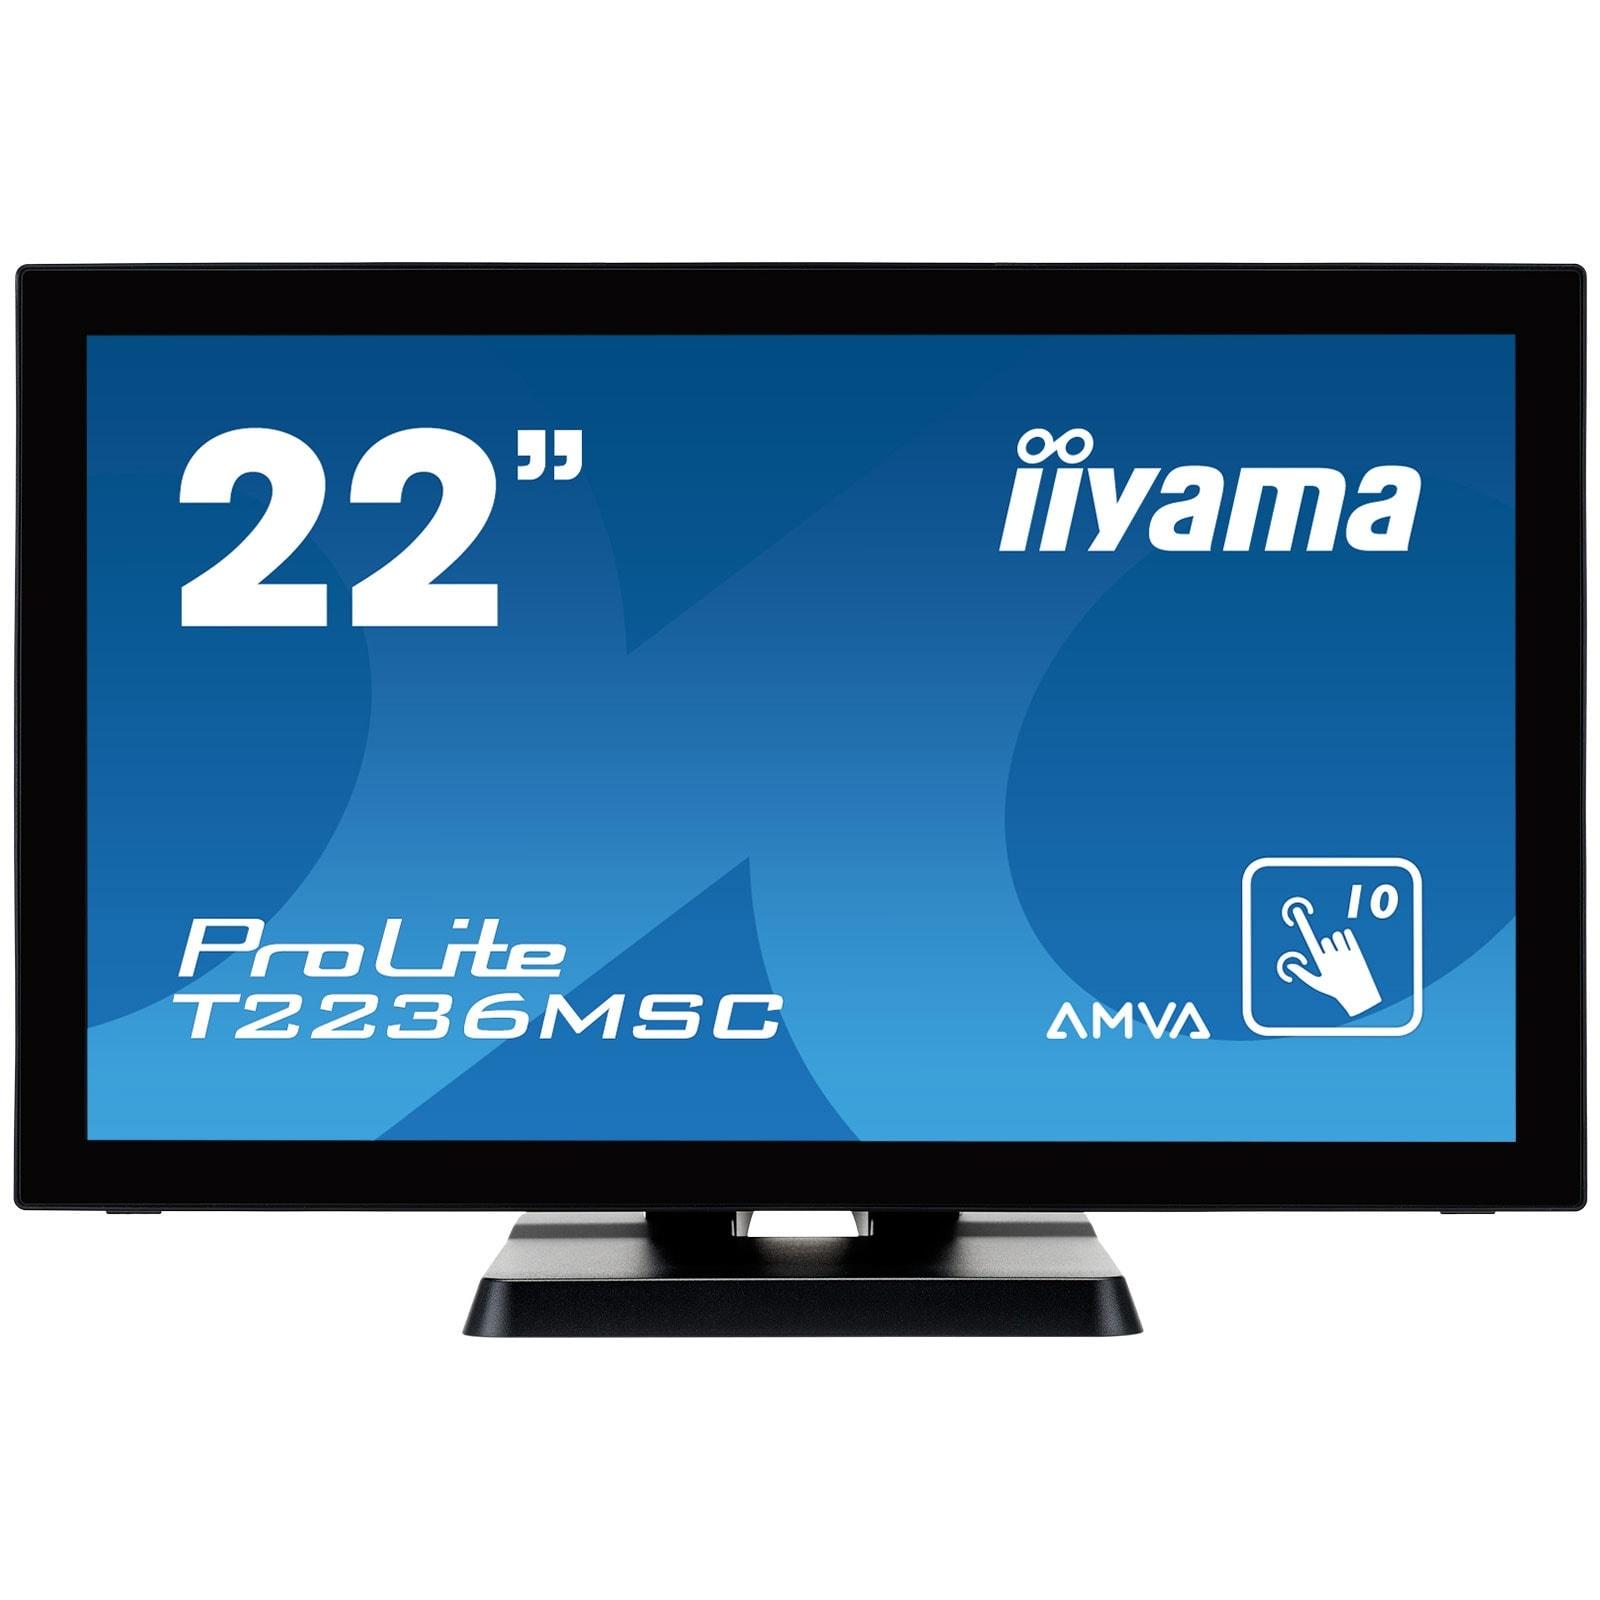 Iiyama T2236MSC-B2 (T2236MSC-B2) - Achat / Vente Ecran PC sur Cybertek.fr - 0